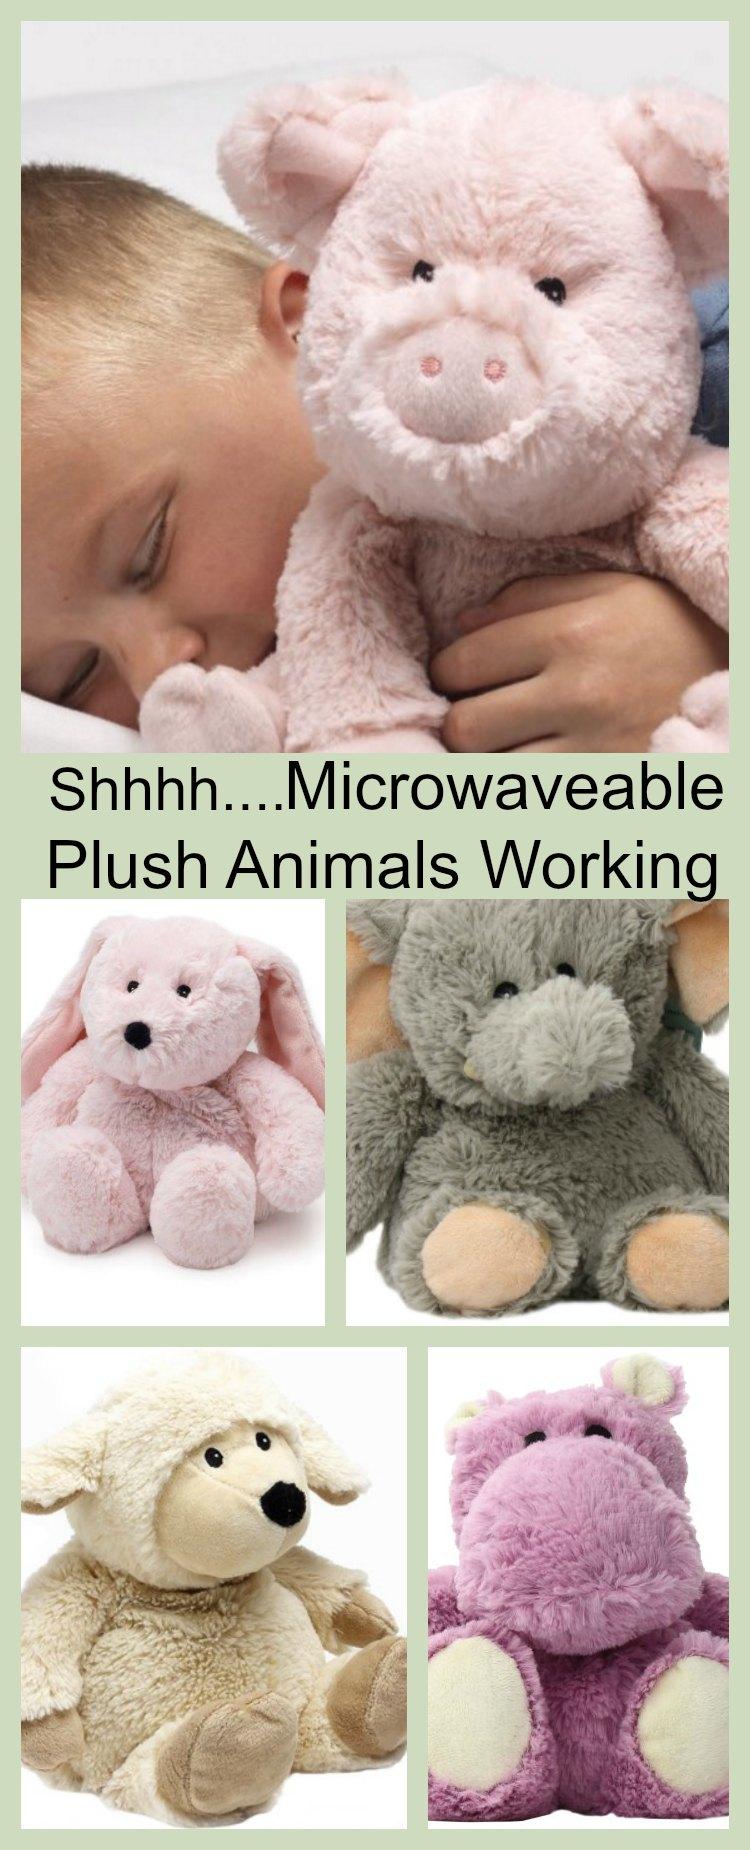 Shhhh...Microwaveable Plush Animals Working